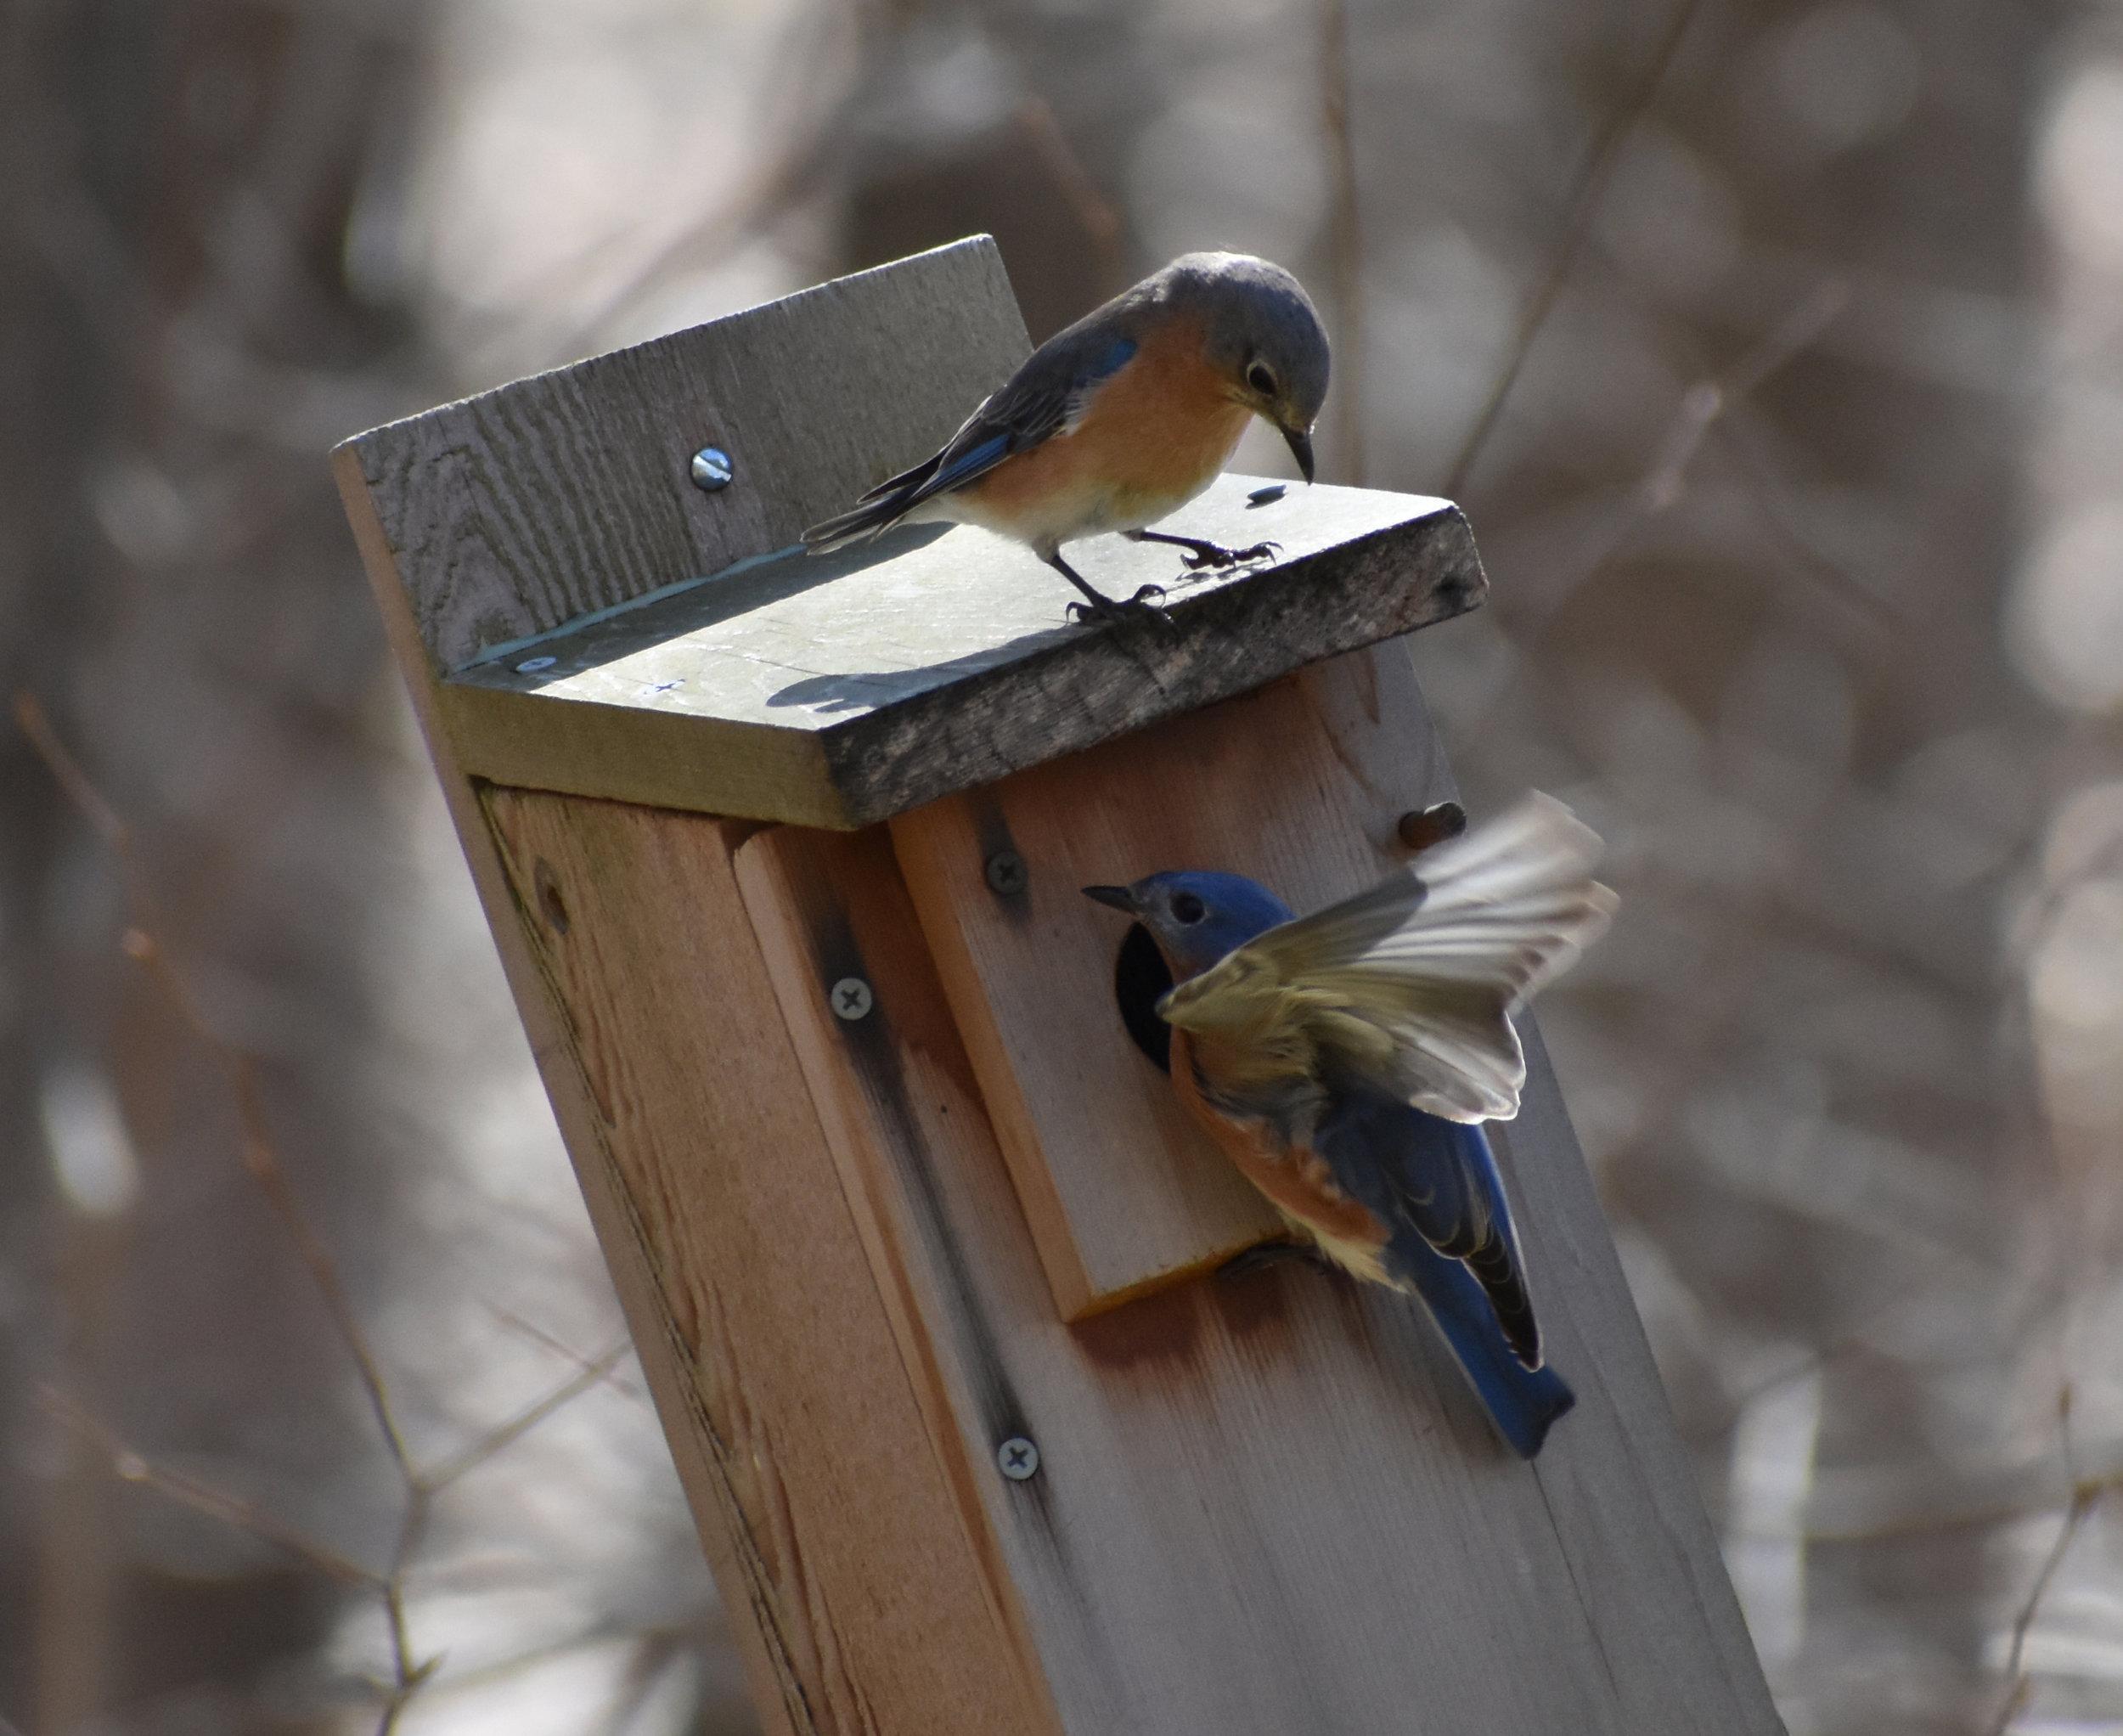 Shelter: Pair of Eastern Bluebird inspecting a nesting box